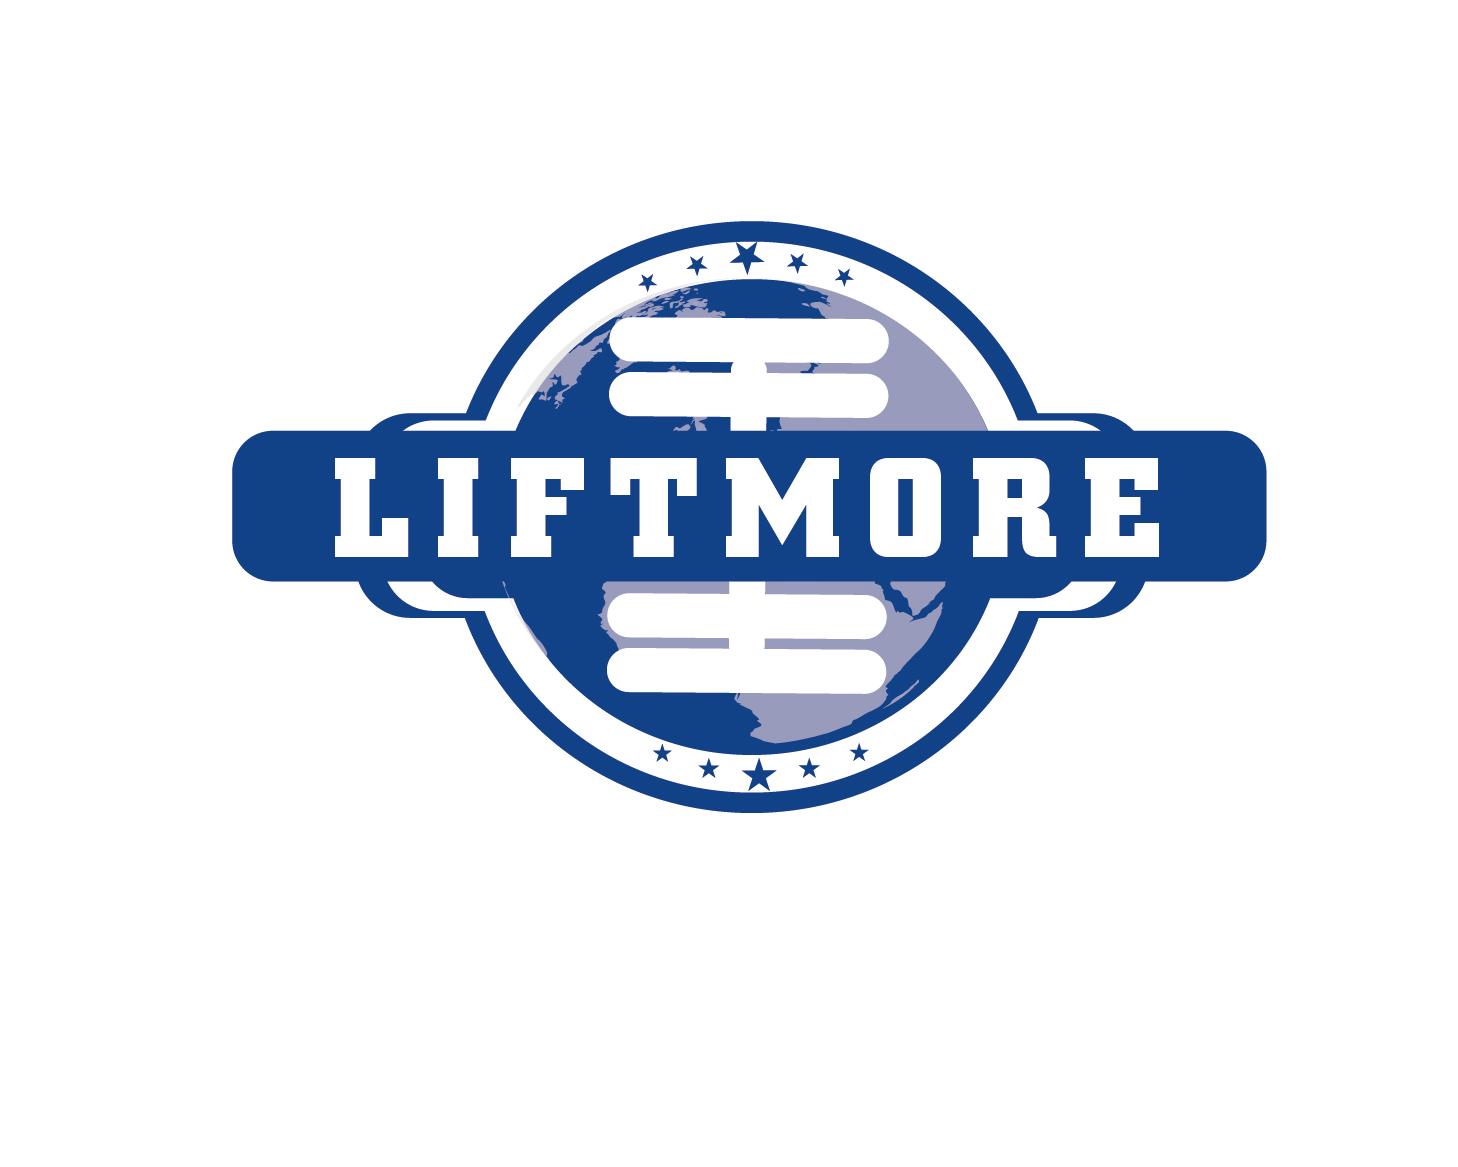 Logo Design by VENTSISLAV KOVACHEV - Entry No. 8 in the Logo Design Contest Unique Logo Design Wanted for Liftmore.